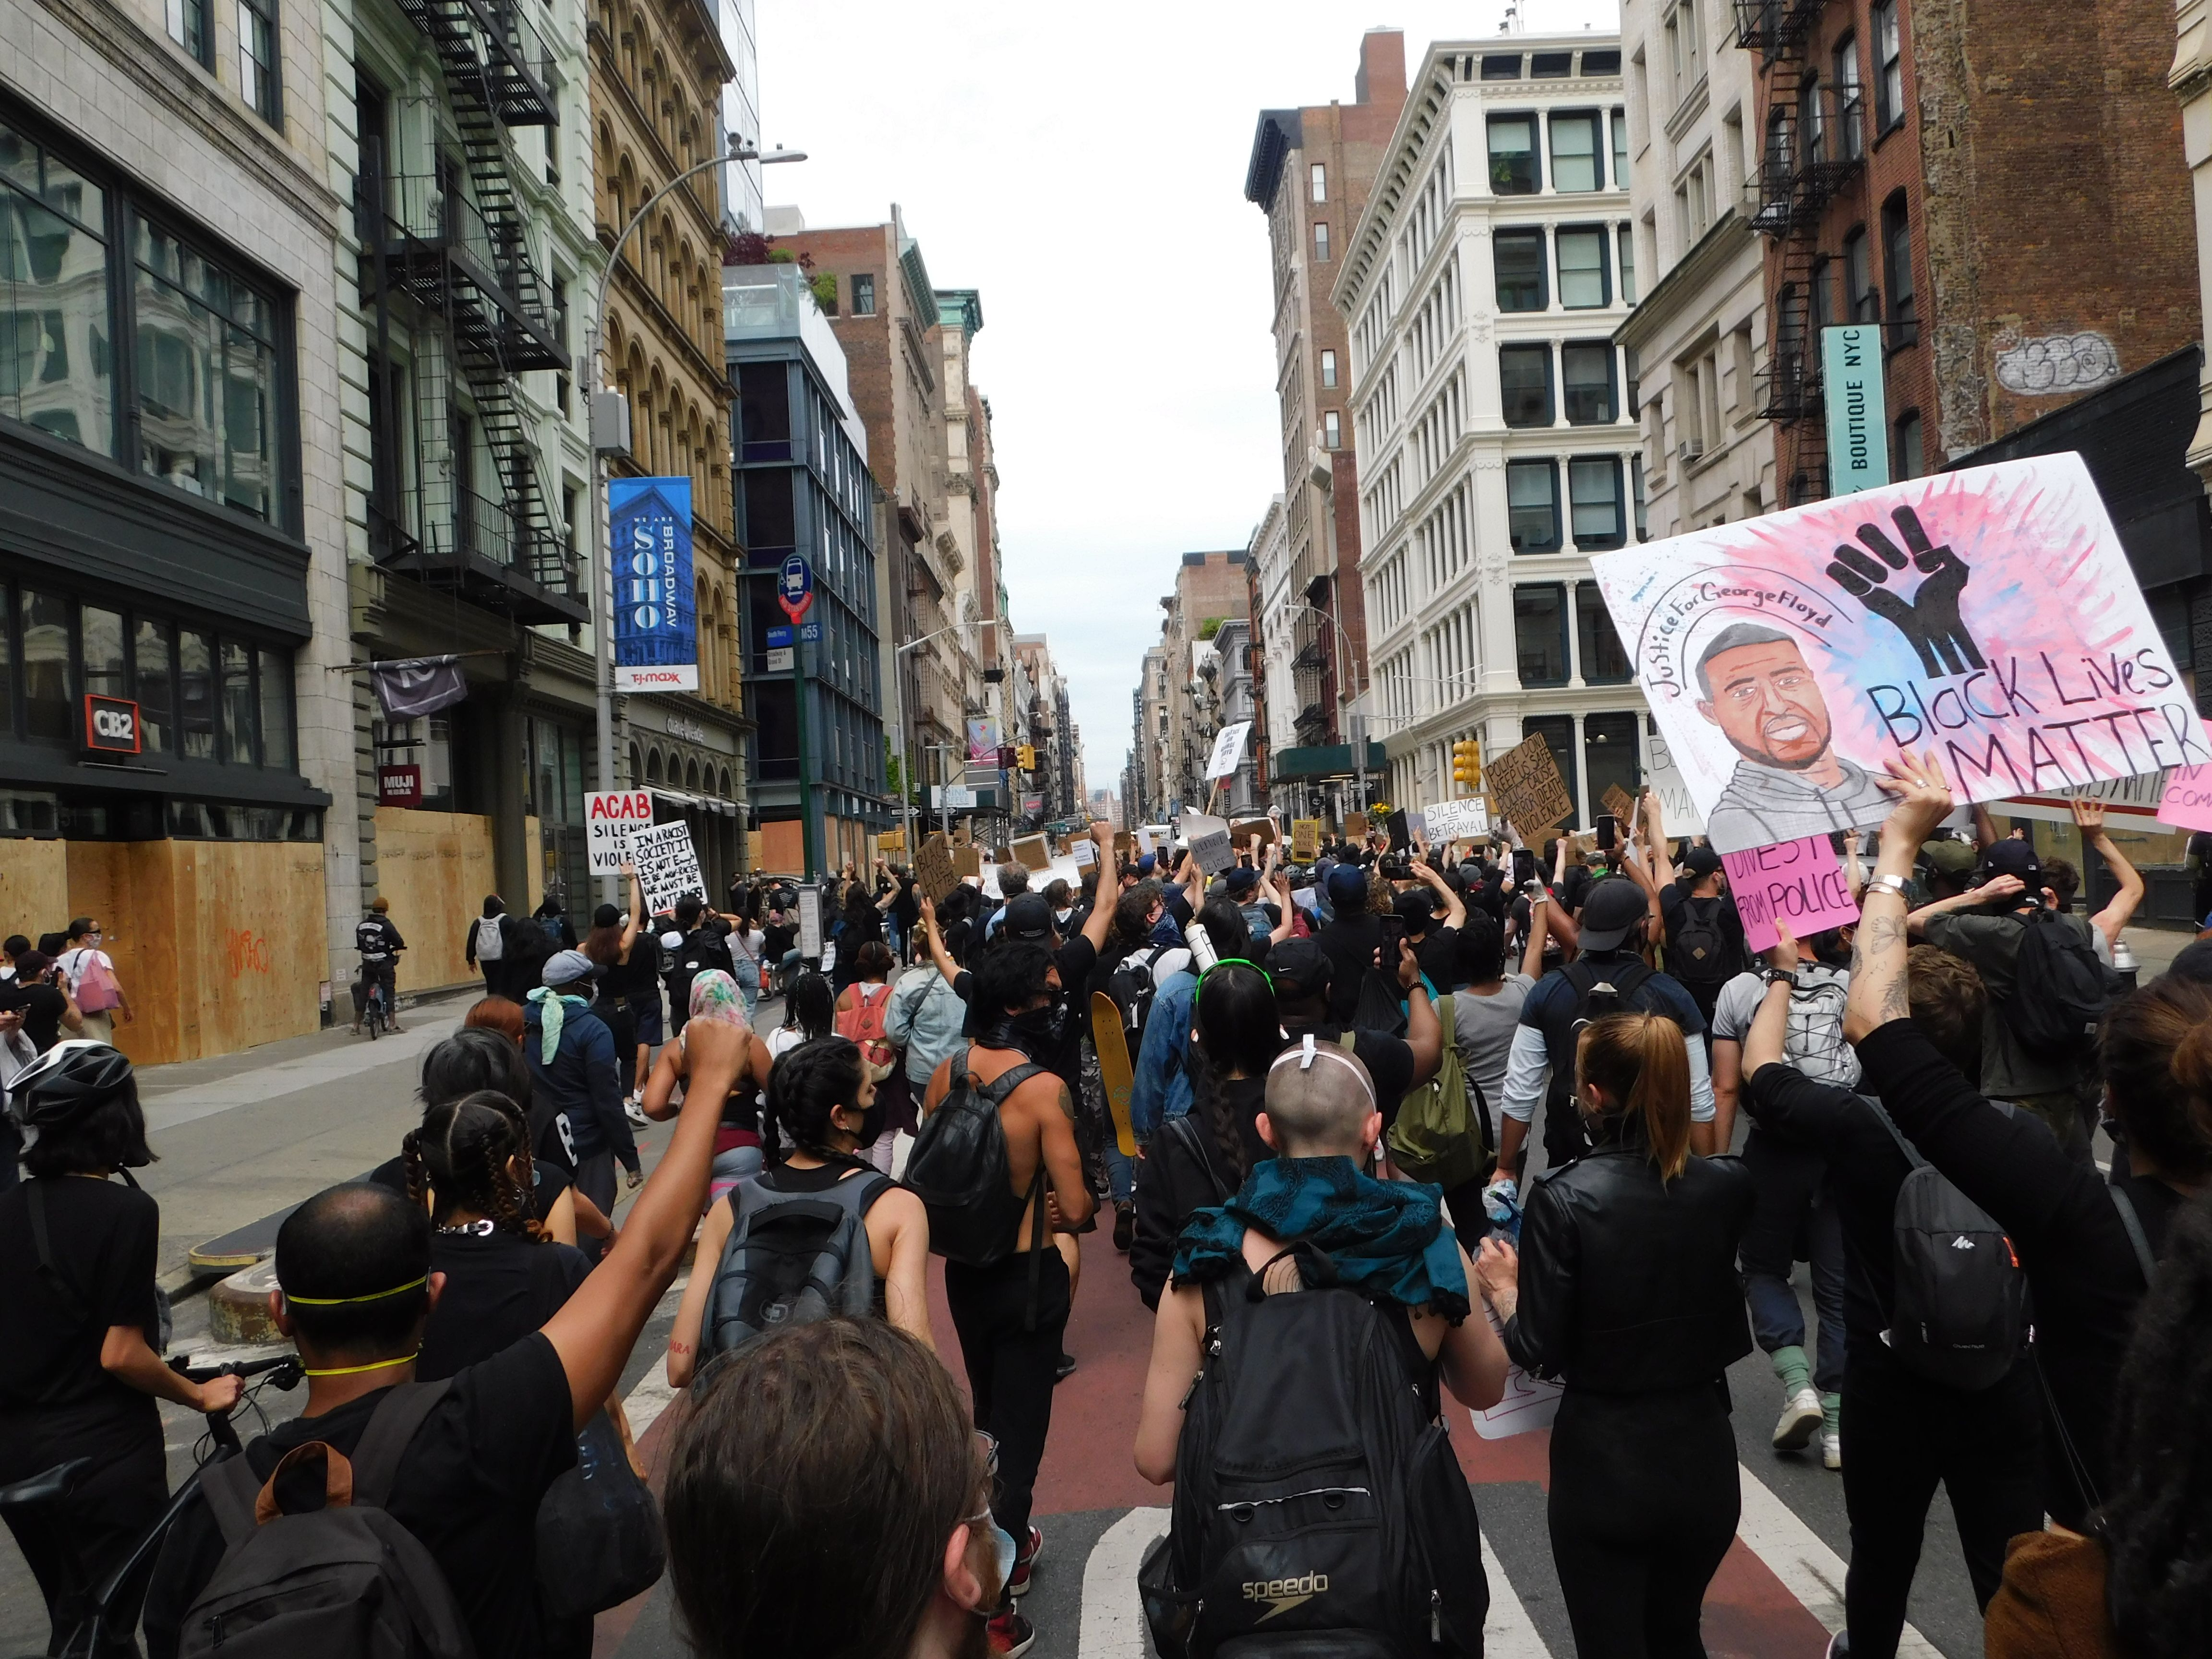 Soho New York City Blm Protest Black Lives Matter Protest Black Lives Matter Black Lives